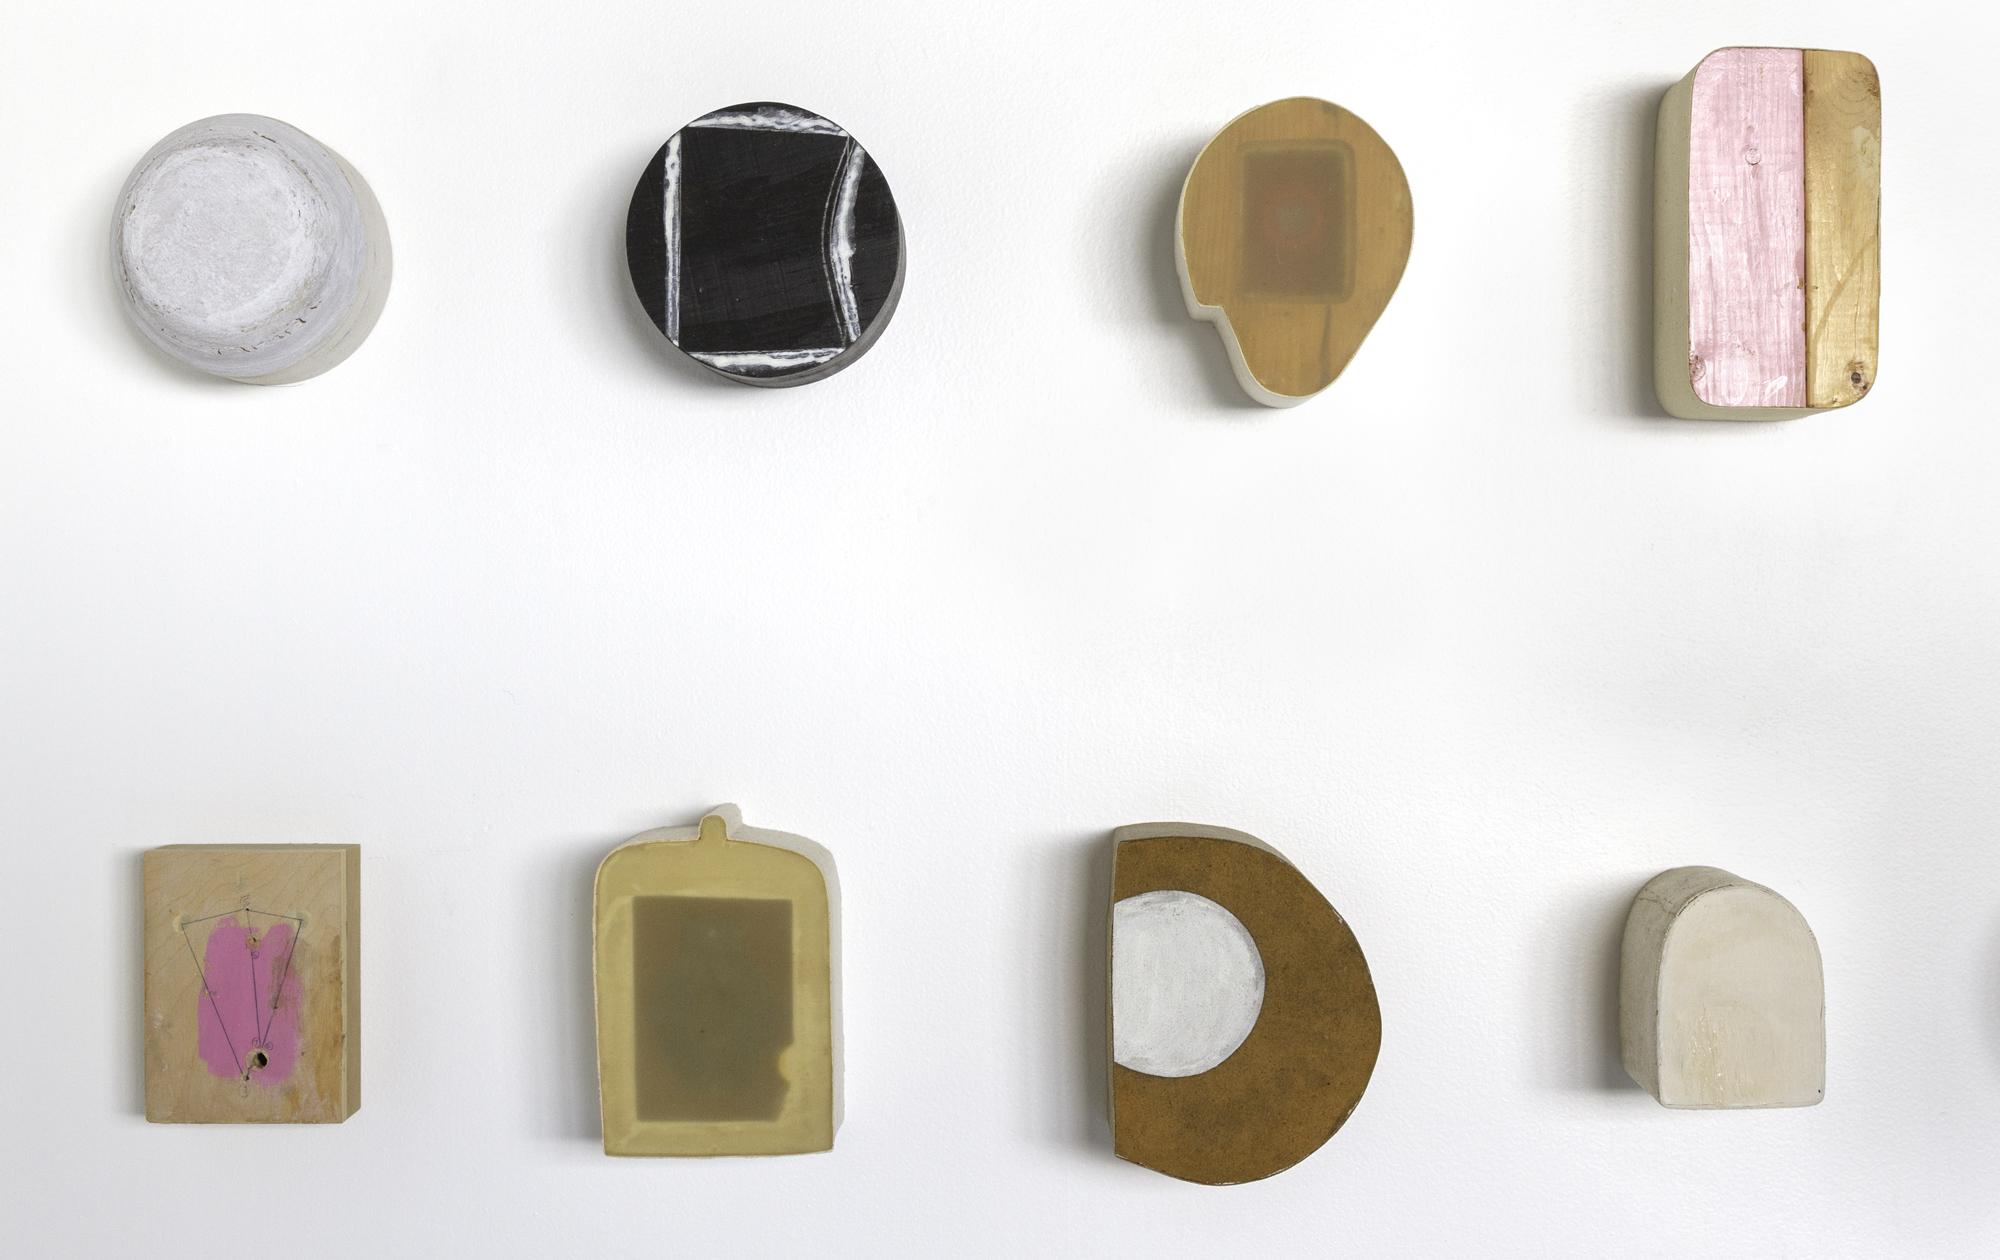 Robert Thiele, Installation view, Museum of Art, DeLand, FL, 2019